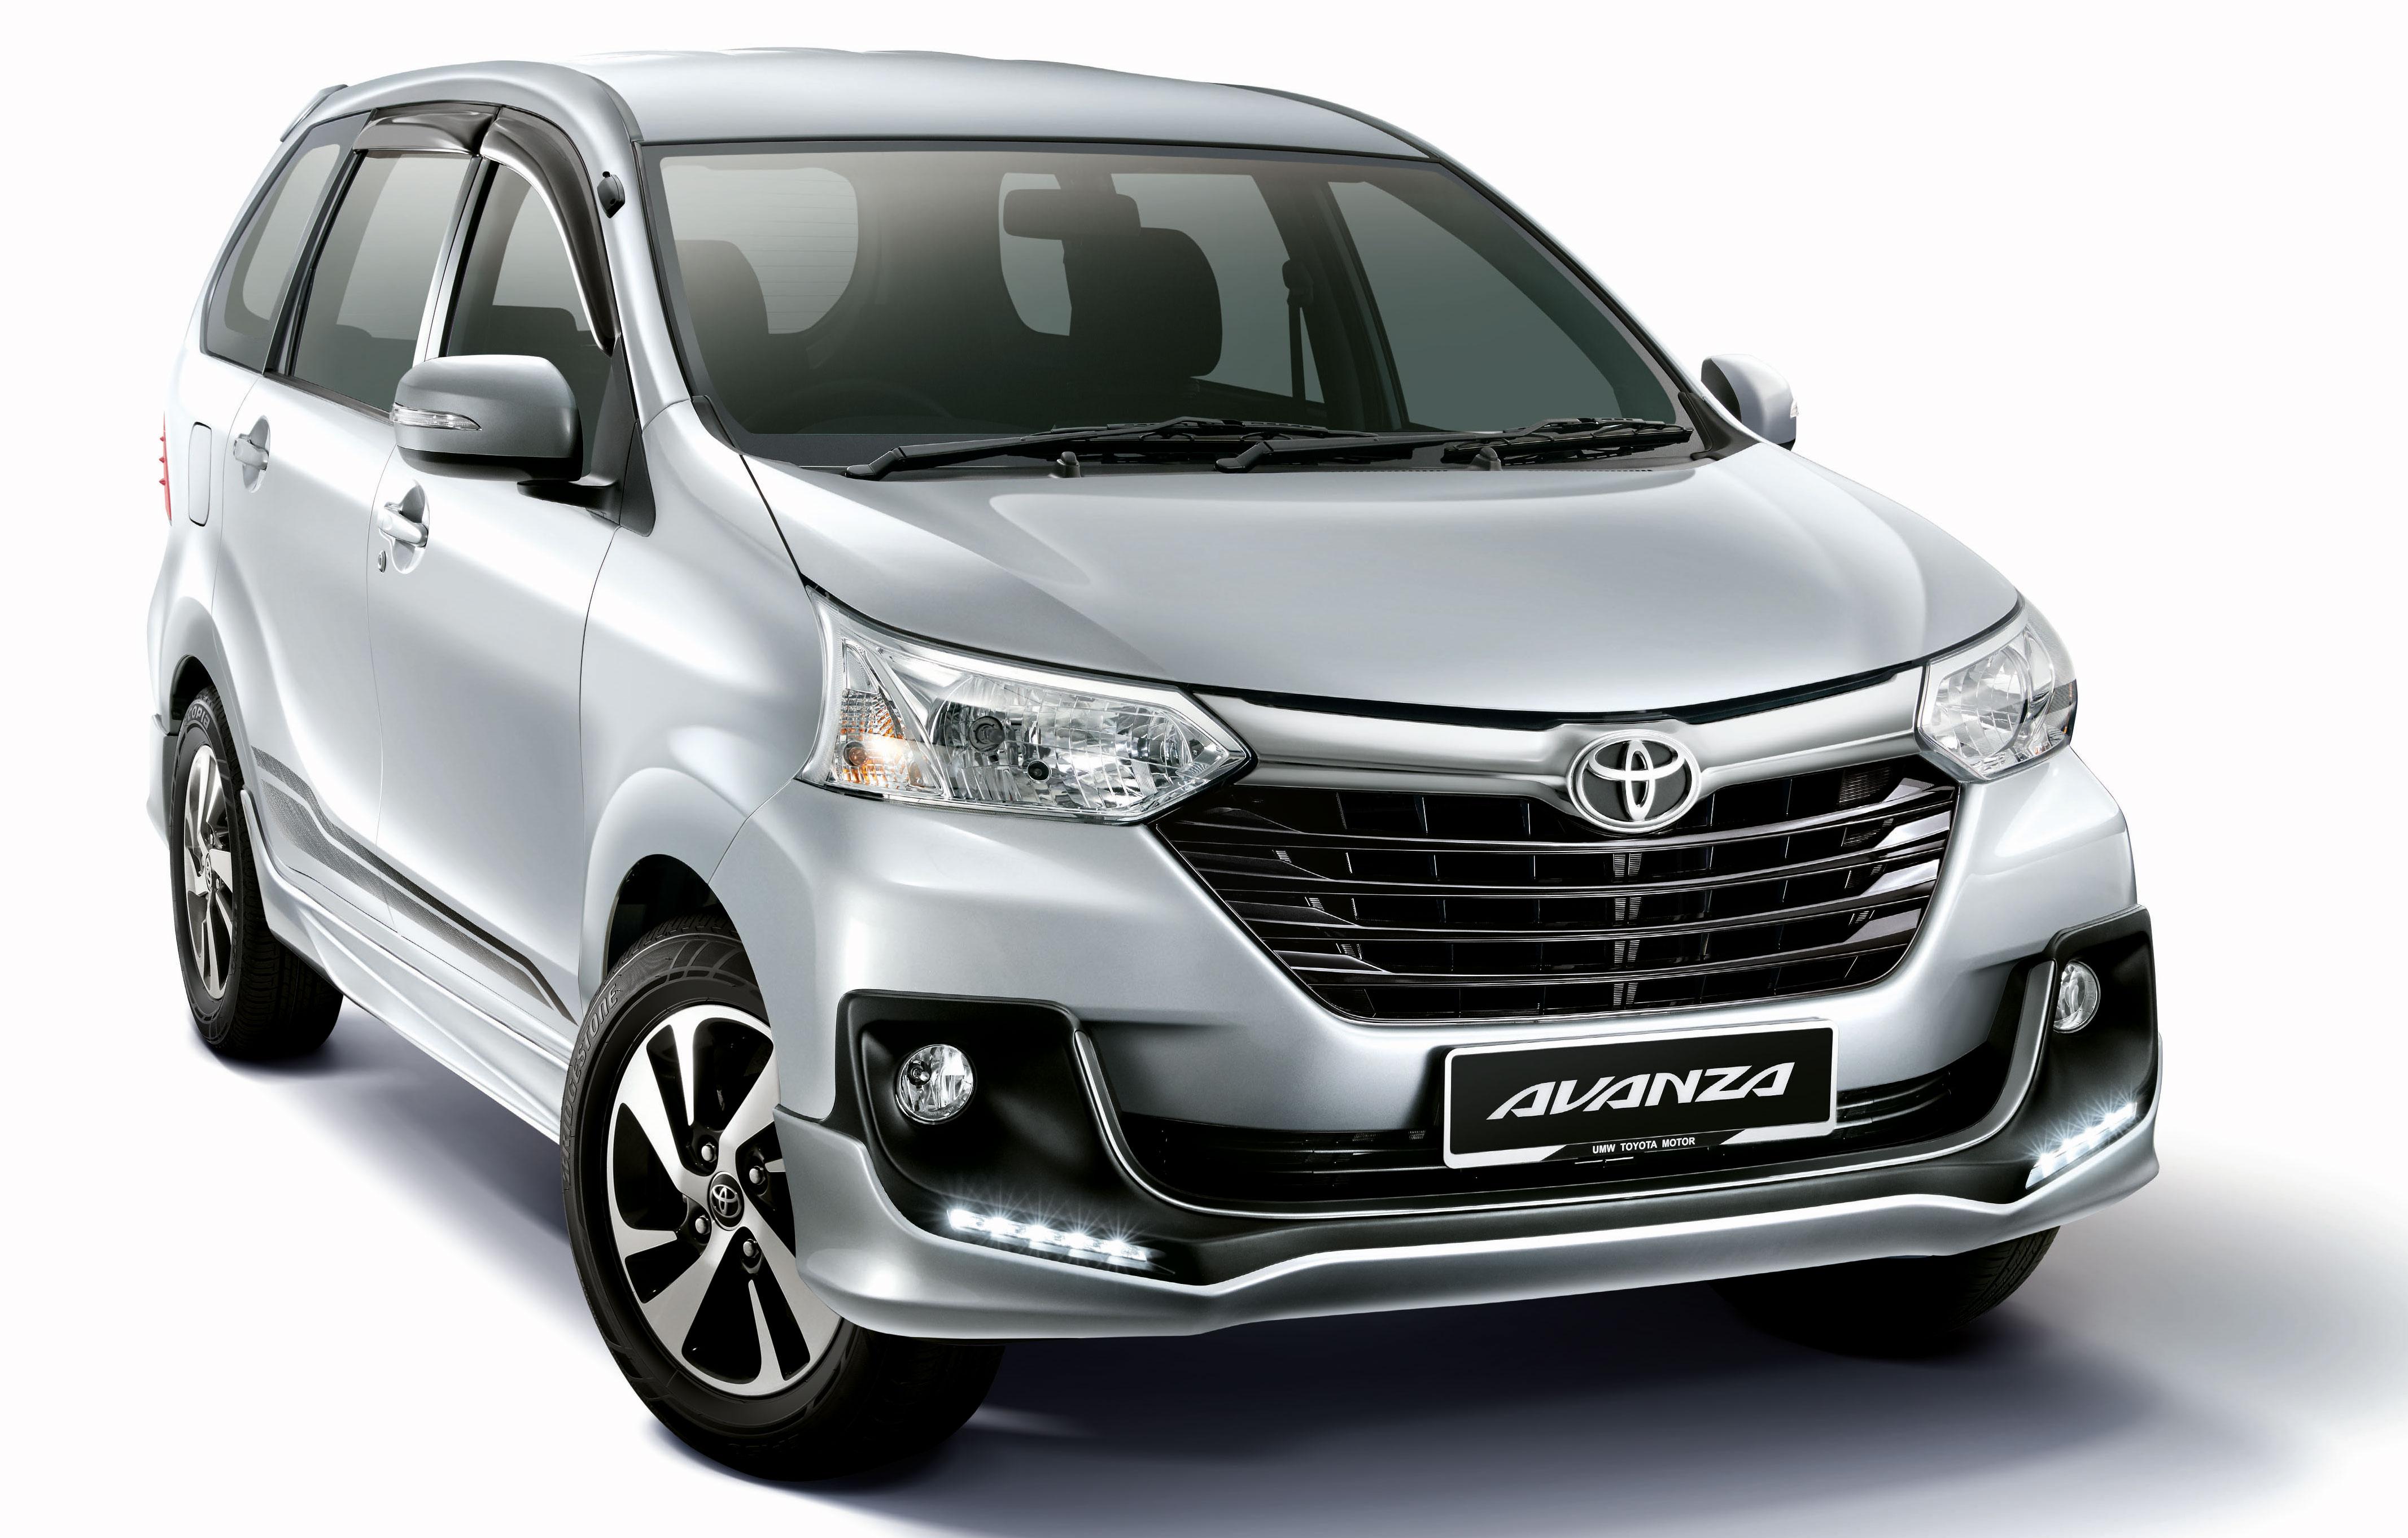 Sejarah Toyota Avanza Mobil Terlaris Pemicu Tren MPV Di Tanah Air